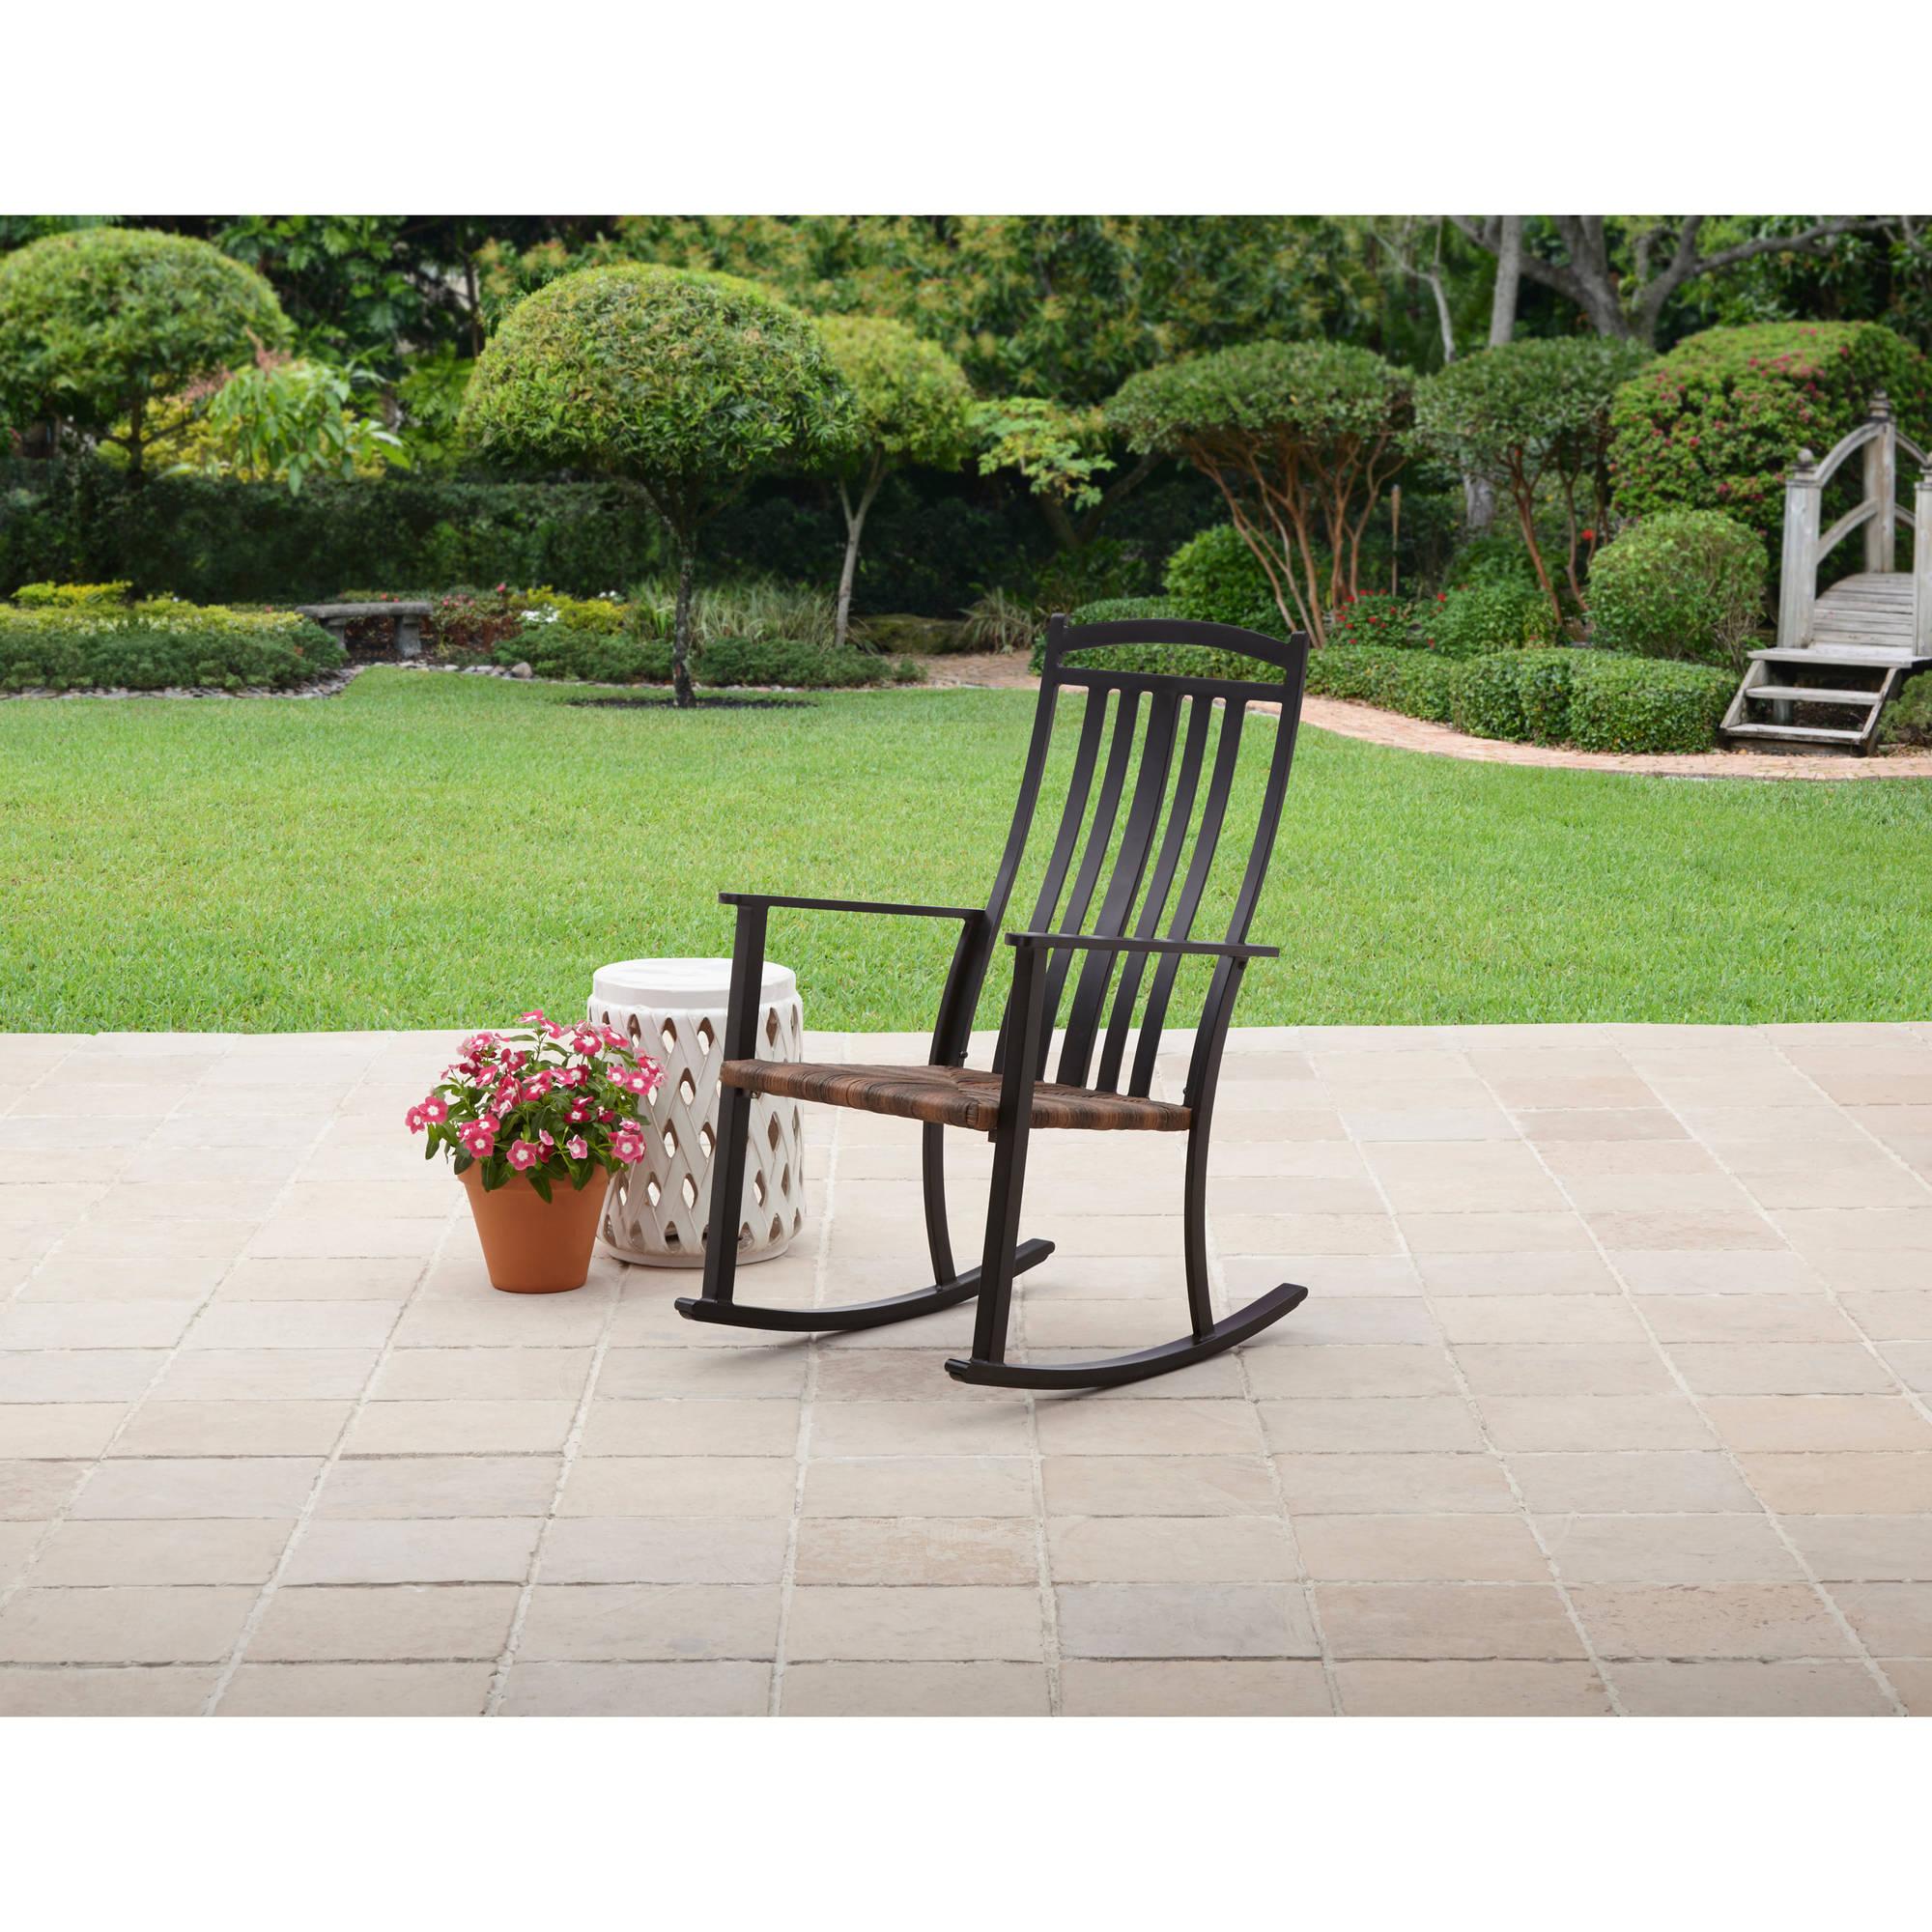 Better Homes & Gardens Belle Drive Outdoor Steel Wicker Rocking High Back Chair